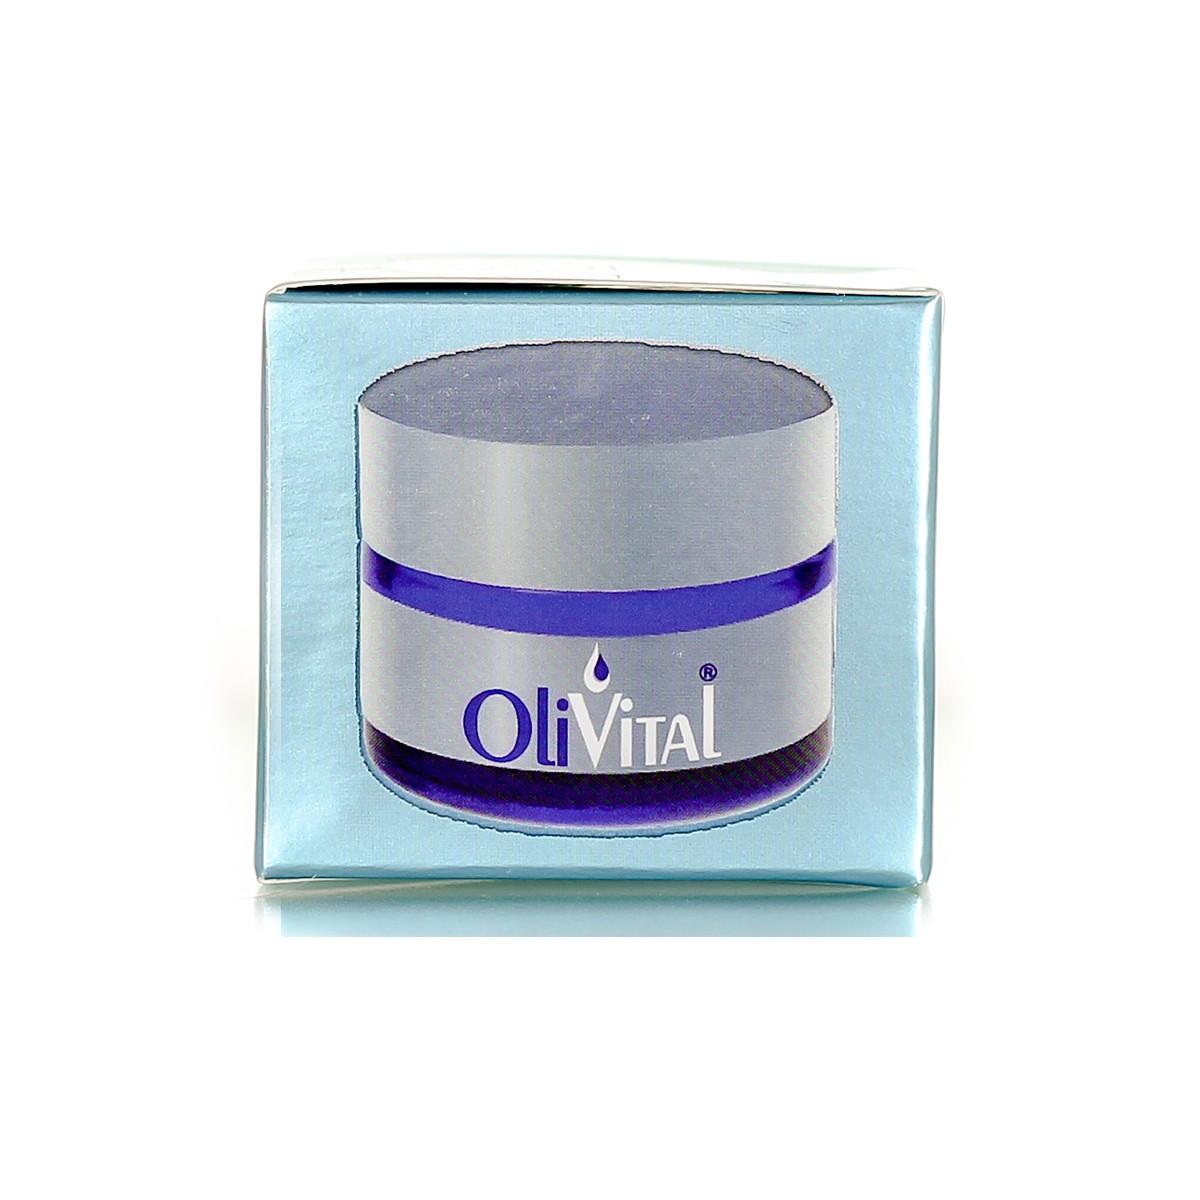 Pure natural murumuru oil OliVital CBN Laboratories